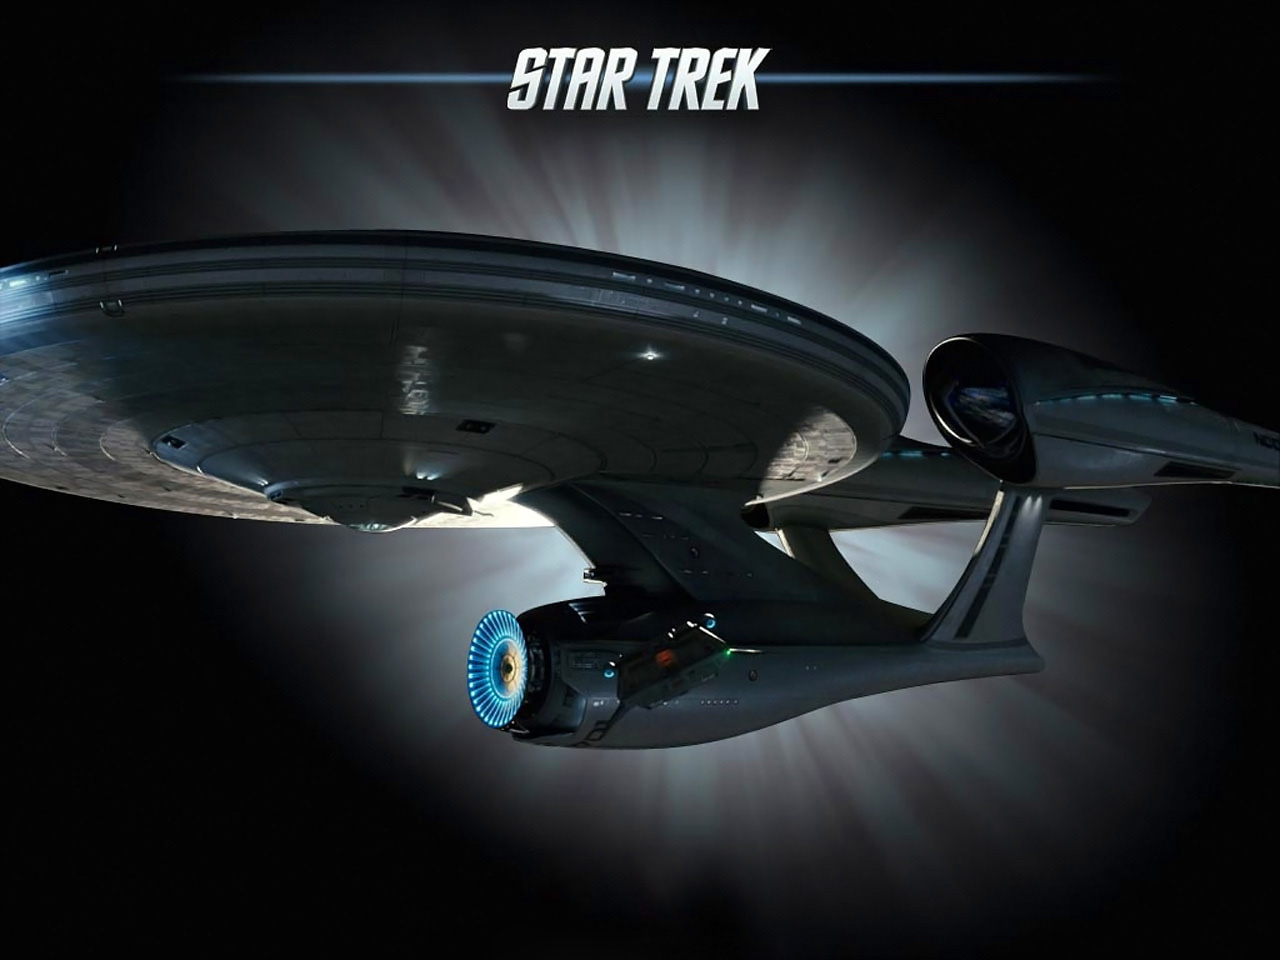 USS Enterprise NCC 1701 in the movie 2013 Star Trek   Movie Wallpapers 1280x960